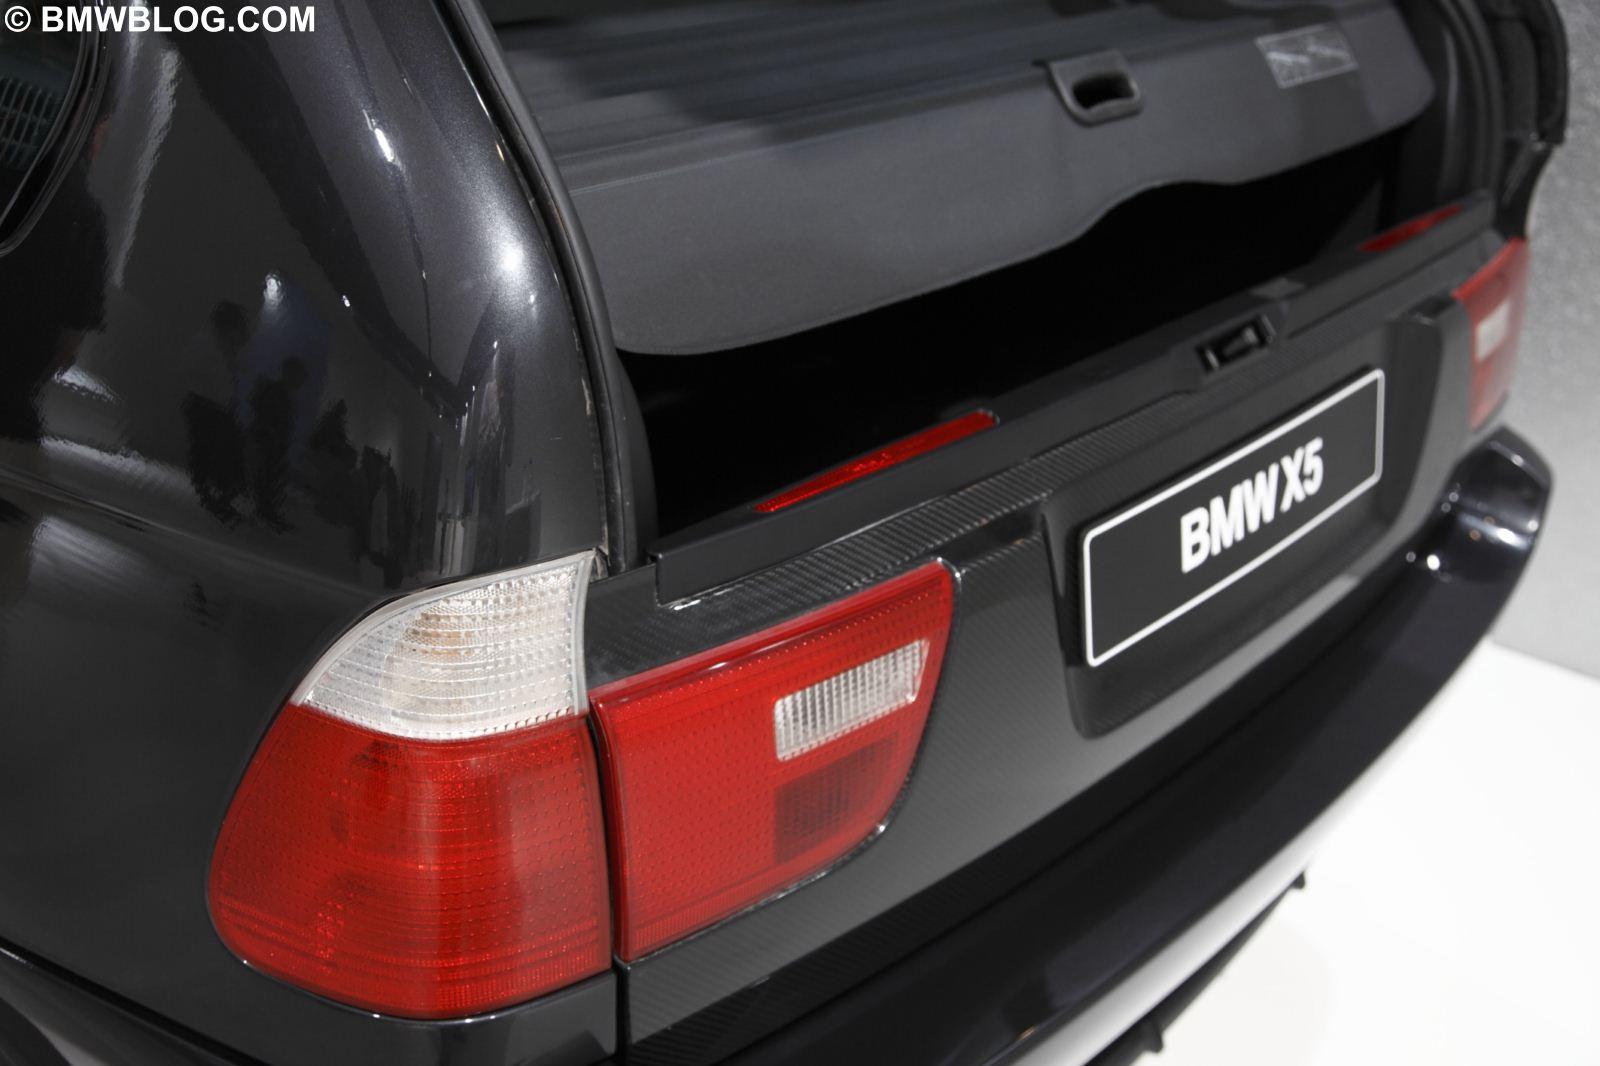 Exclusive Bmw X5 With Carbon Fiber Unibody